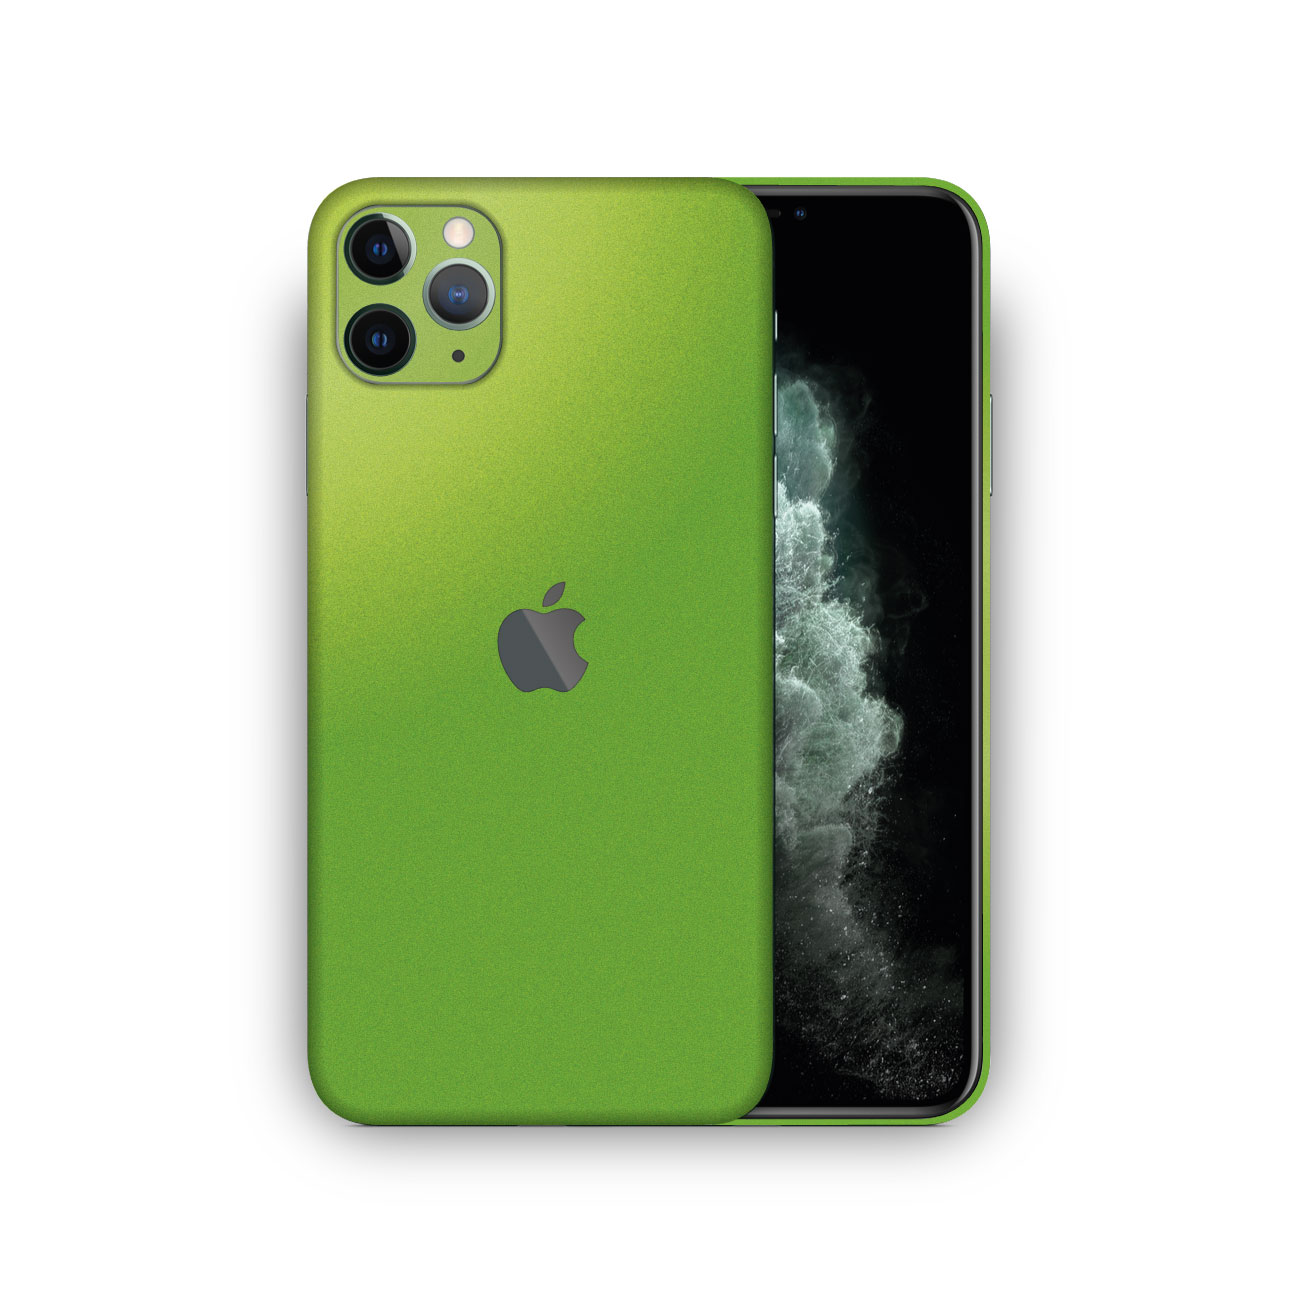 Apple iPhone 11 Pro Max Viper Green Metallic Matte Skin Vinyl Wrap